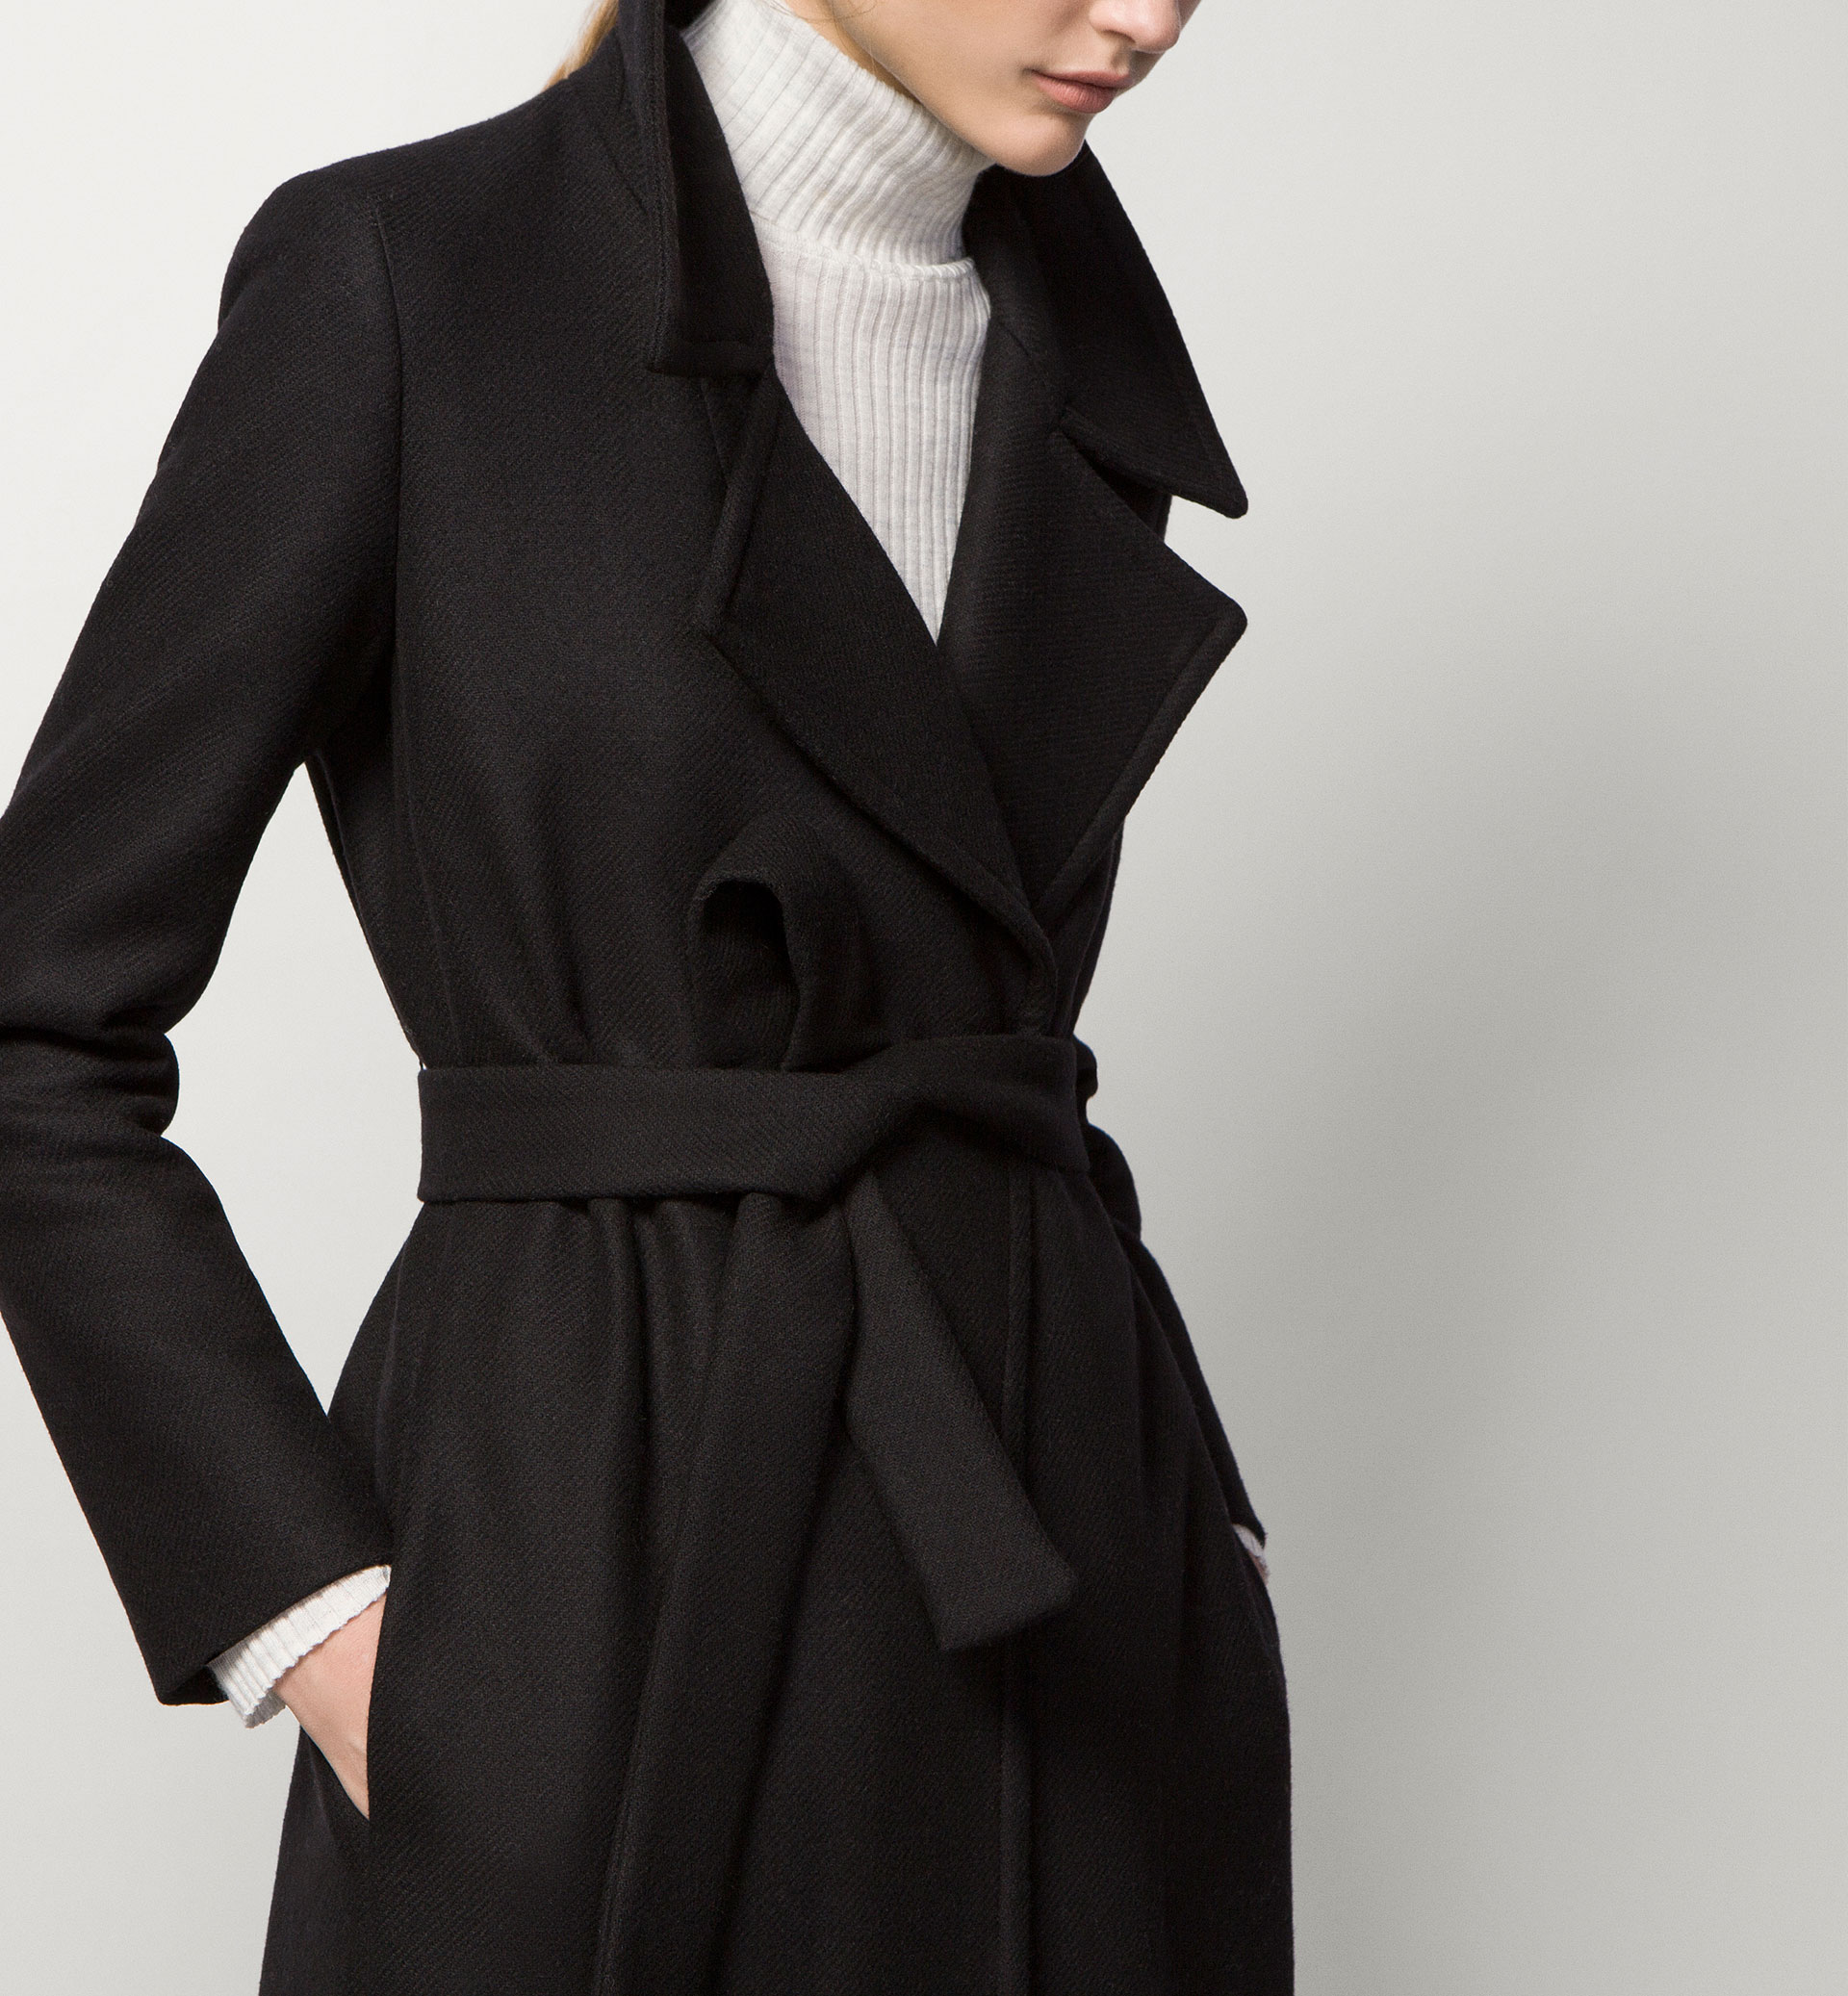 LONG BLACK COAT - Coats - WOMEN - United Kingdom - Massimo Dutti